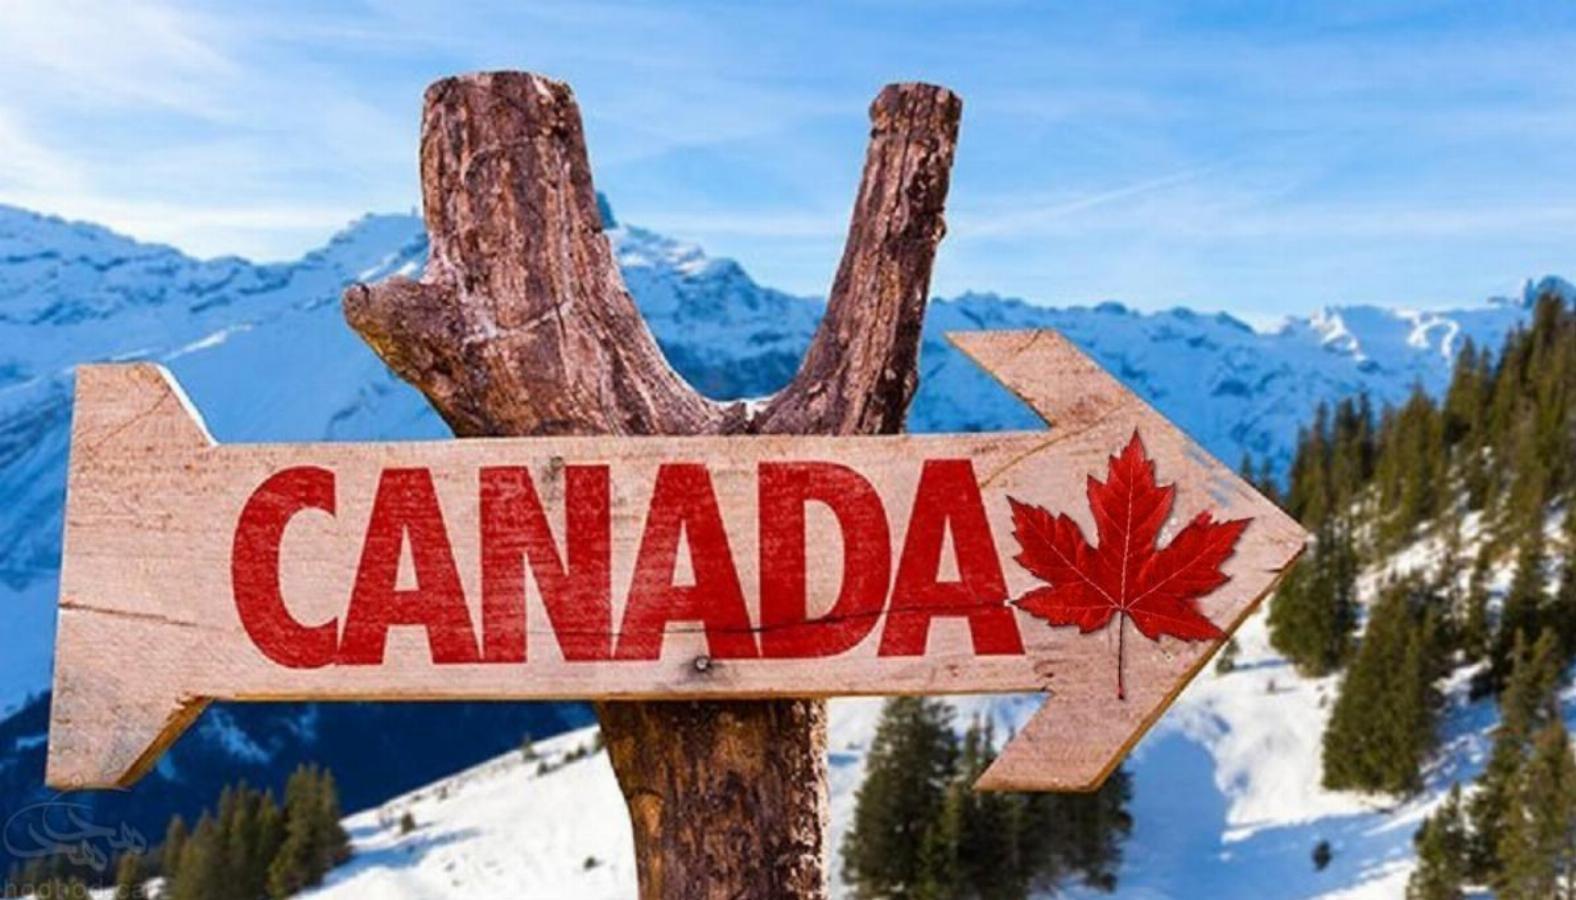 صنعت گردشگری در کانادا